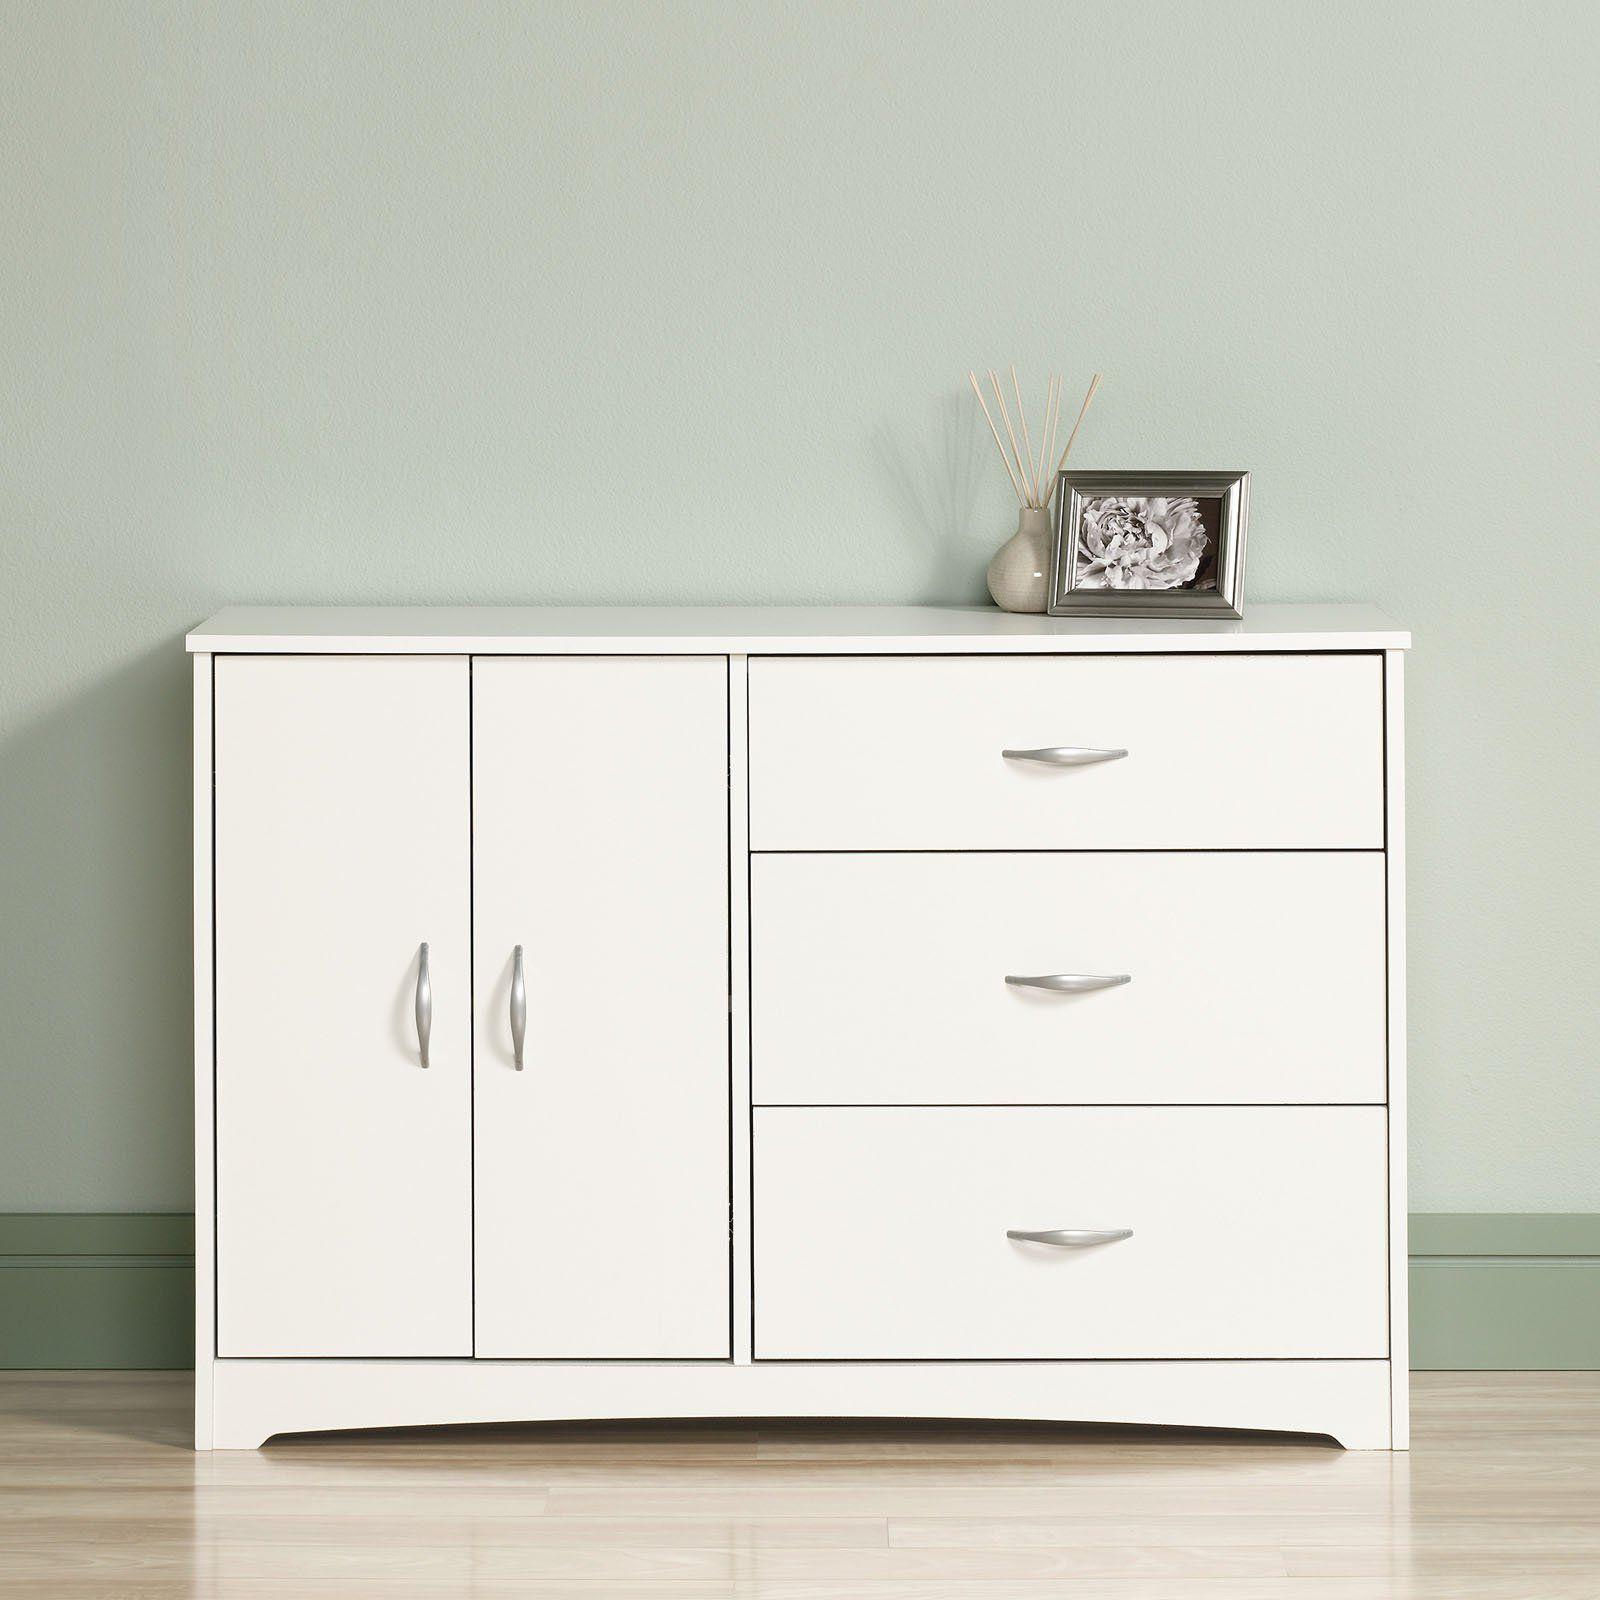 Sauder Beginnings 3 Drawer Dresser 413123 3 drawer